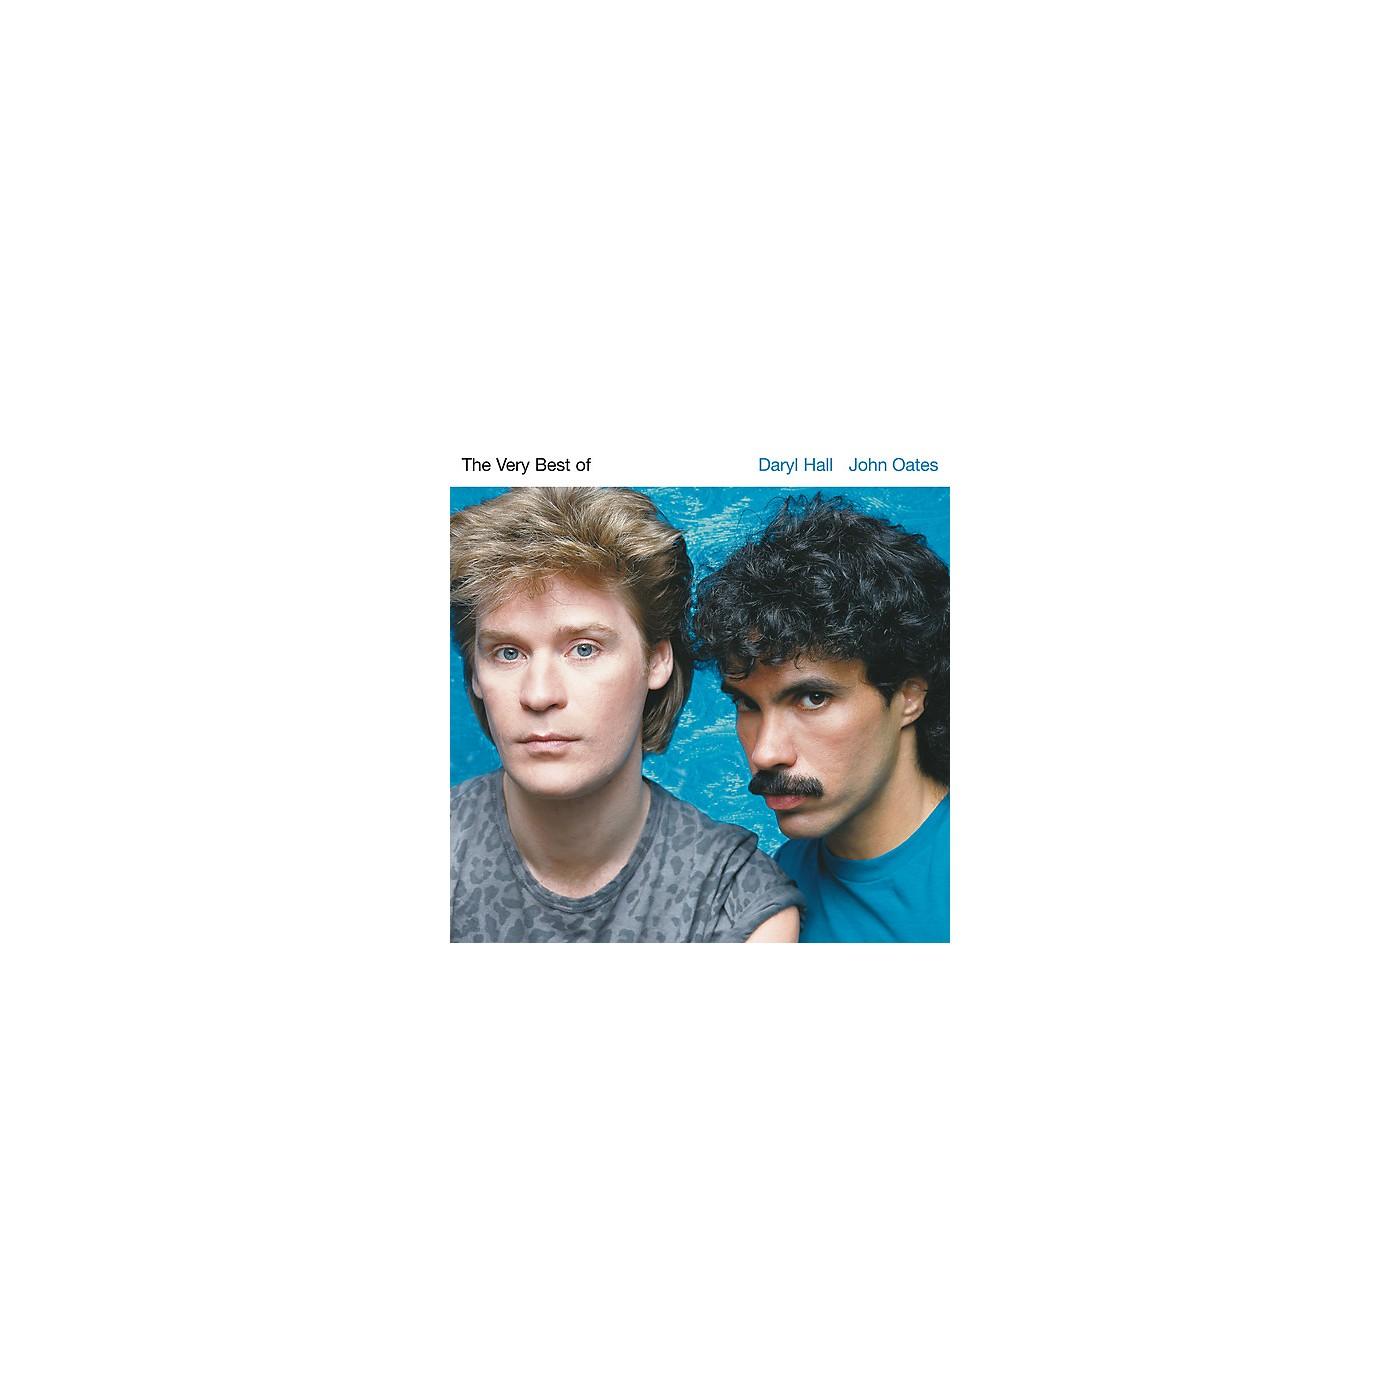 Alliance Hall & Oates - Very Best Of Darryl Hall & John Oates thumbnail